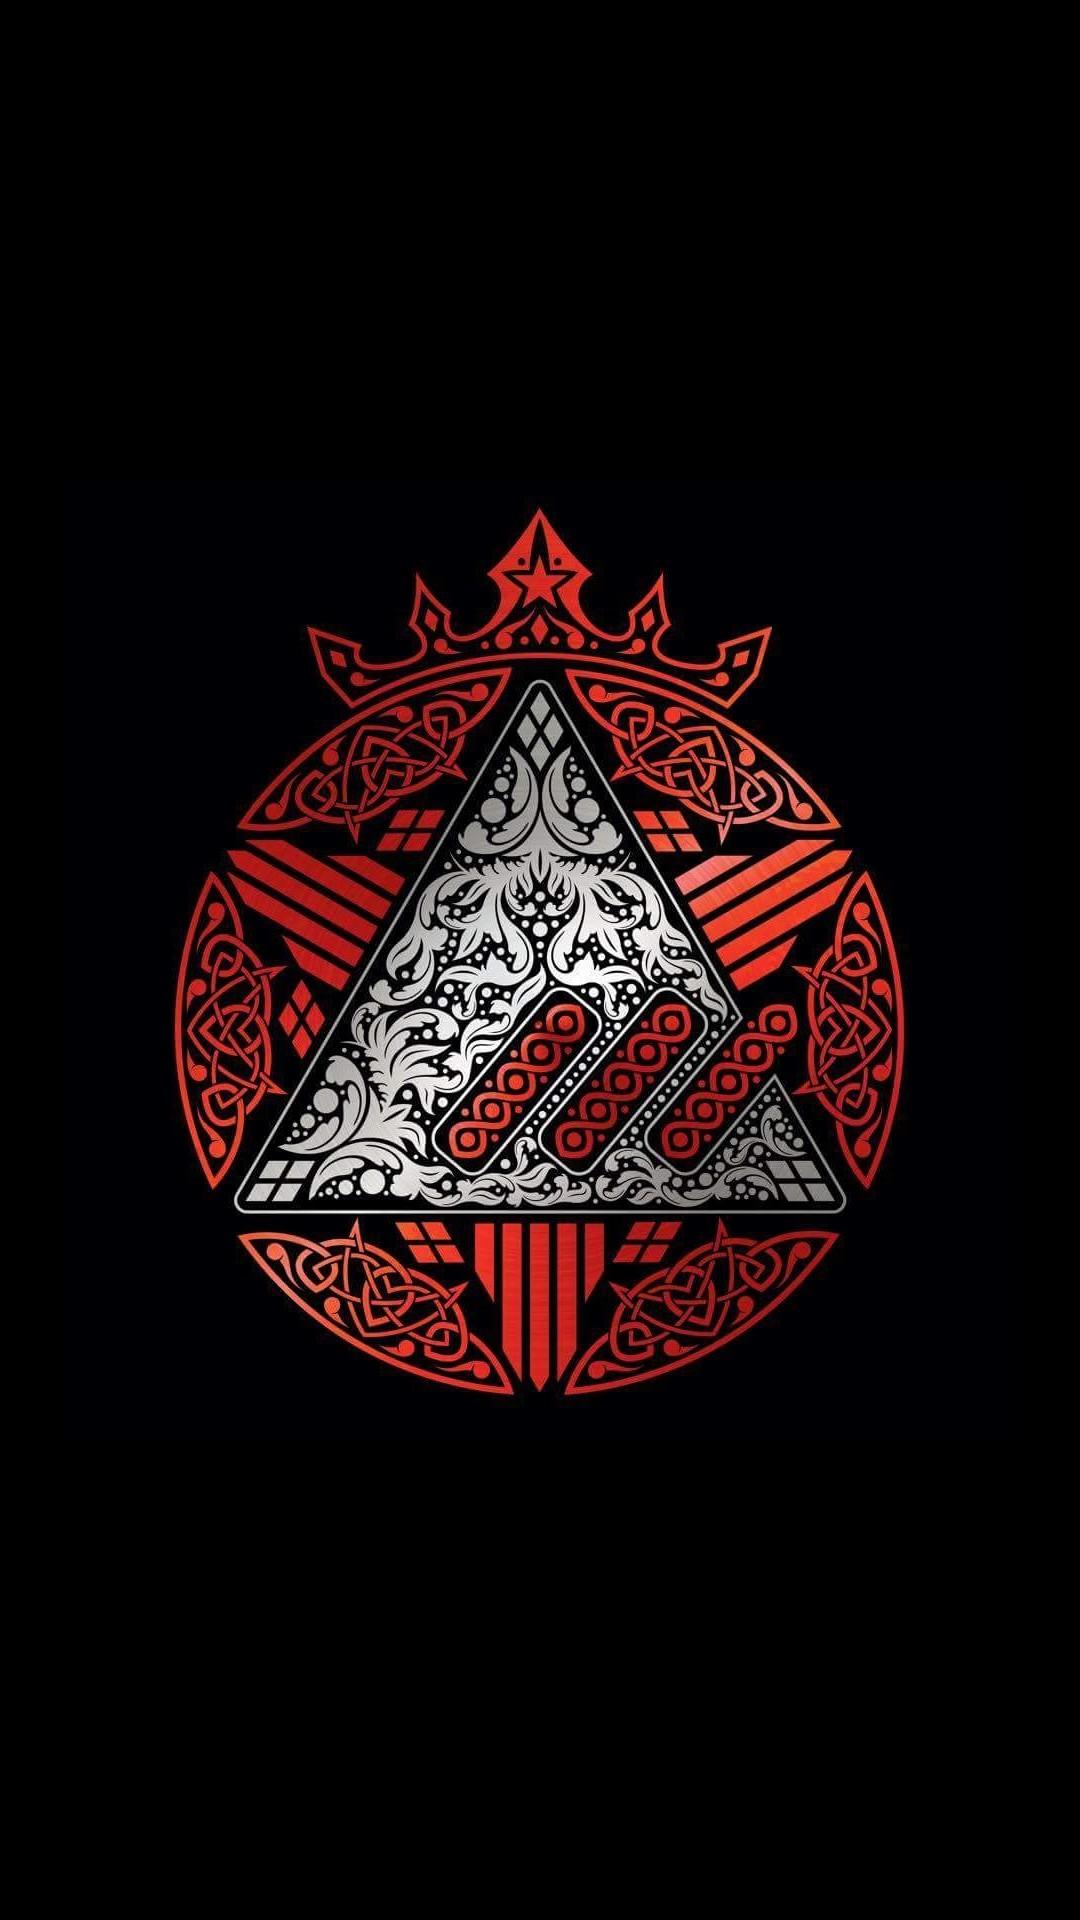 New Monarchy